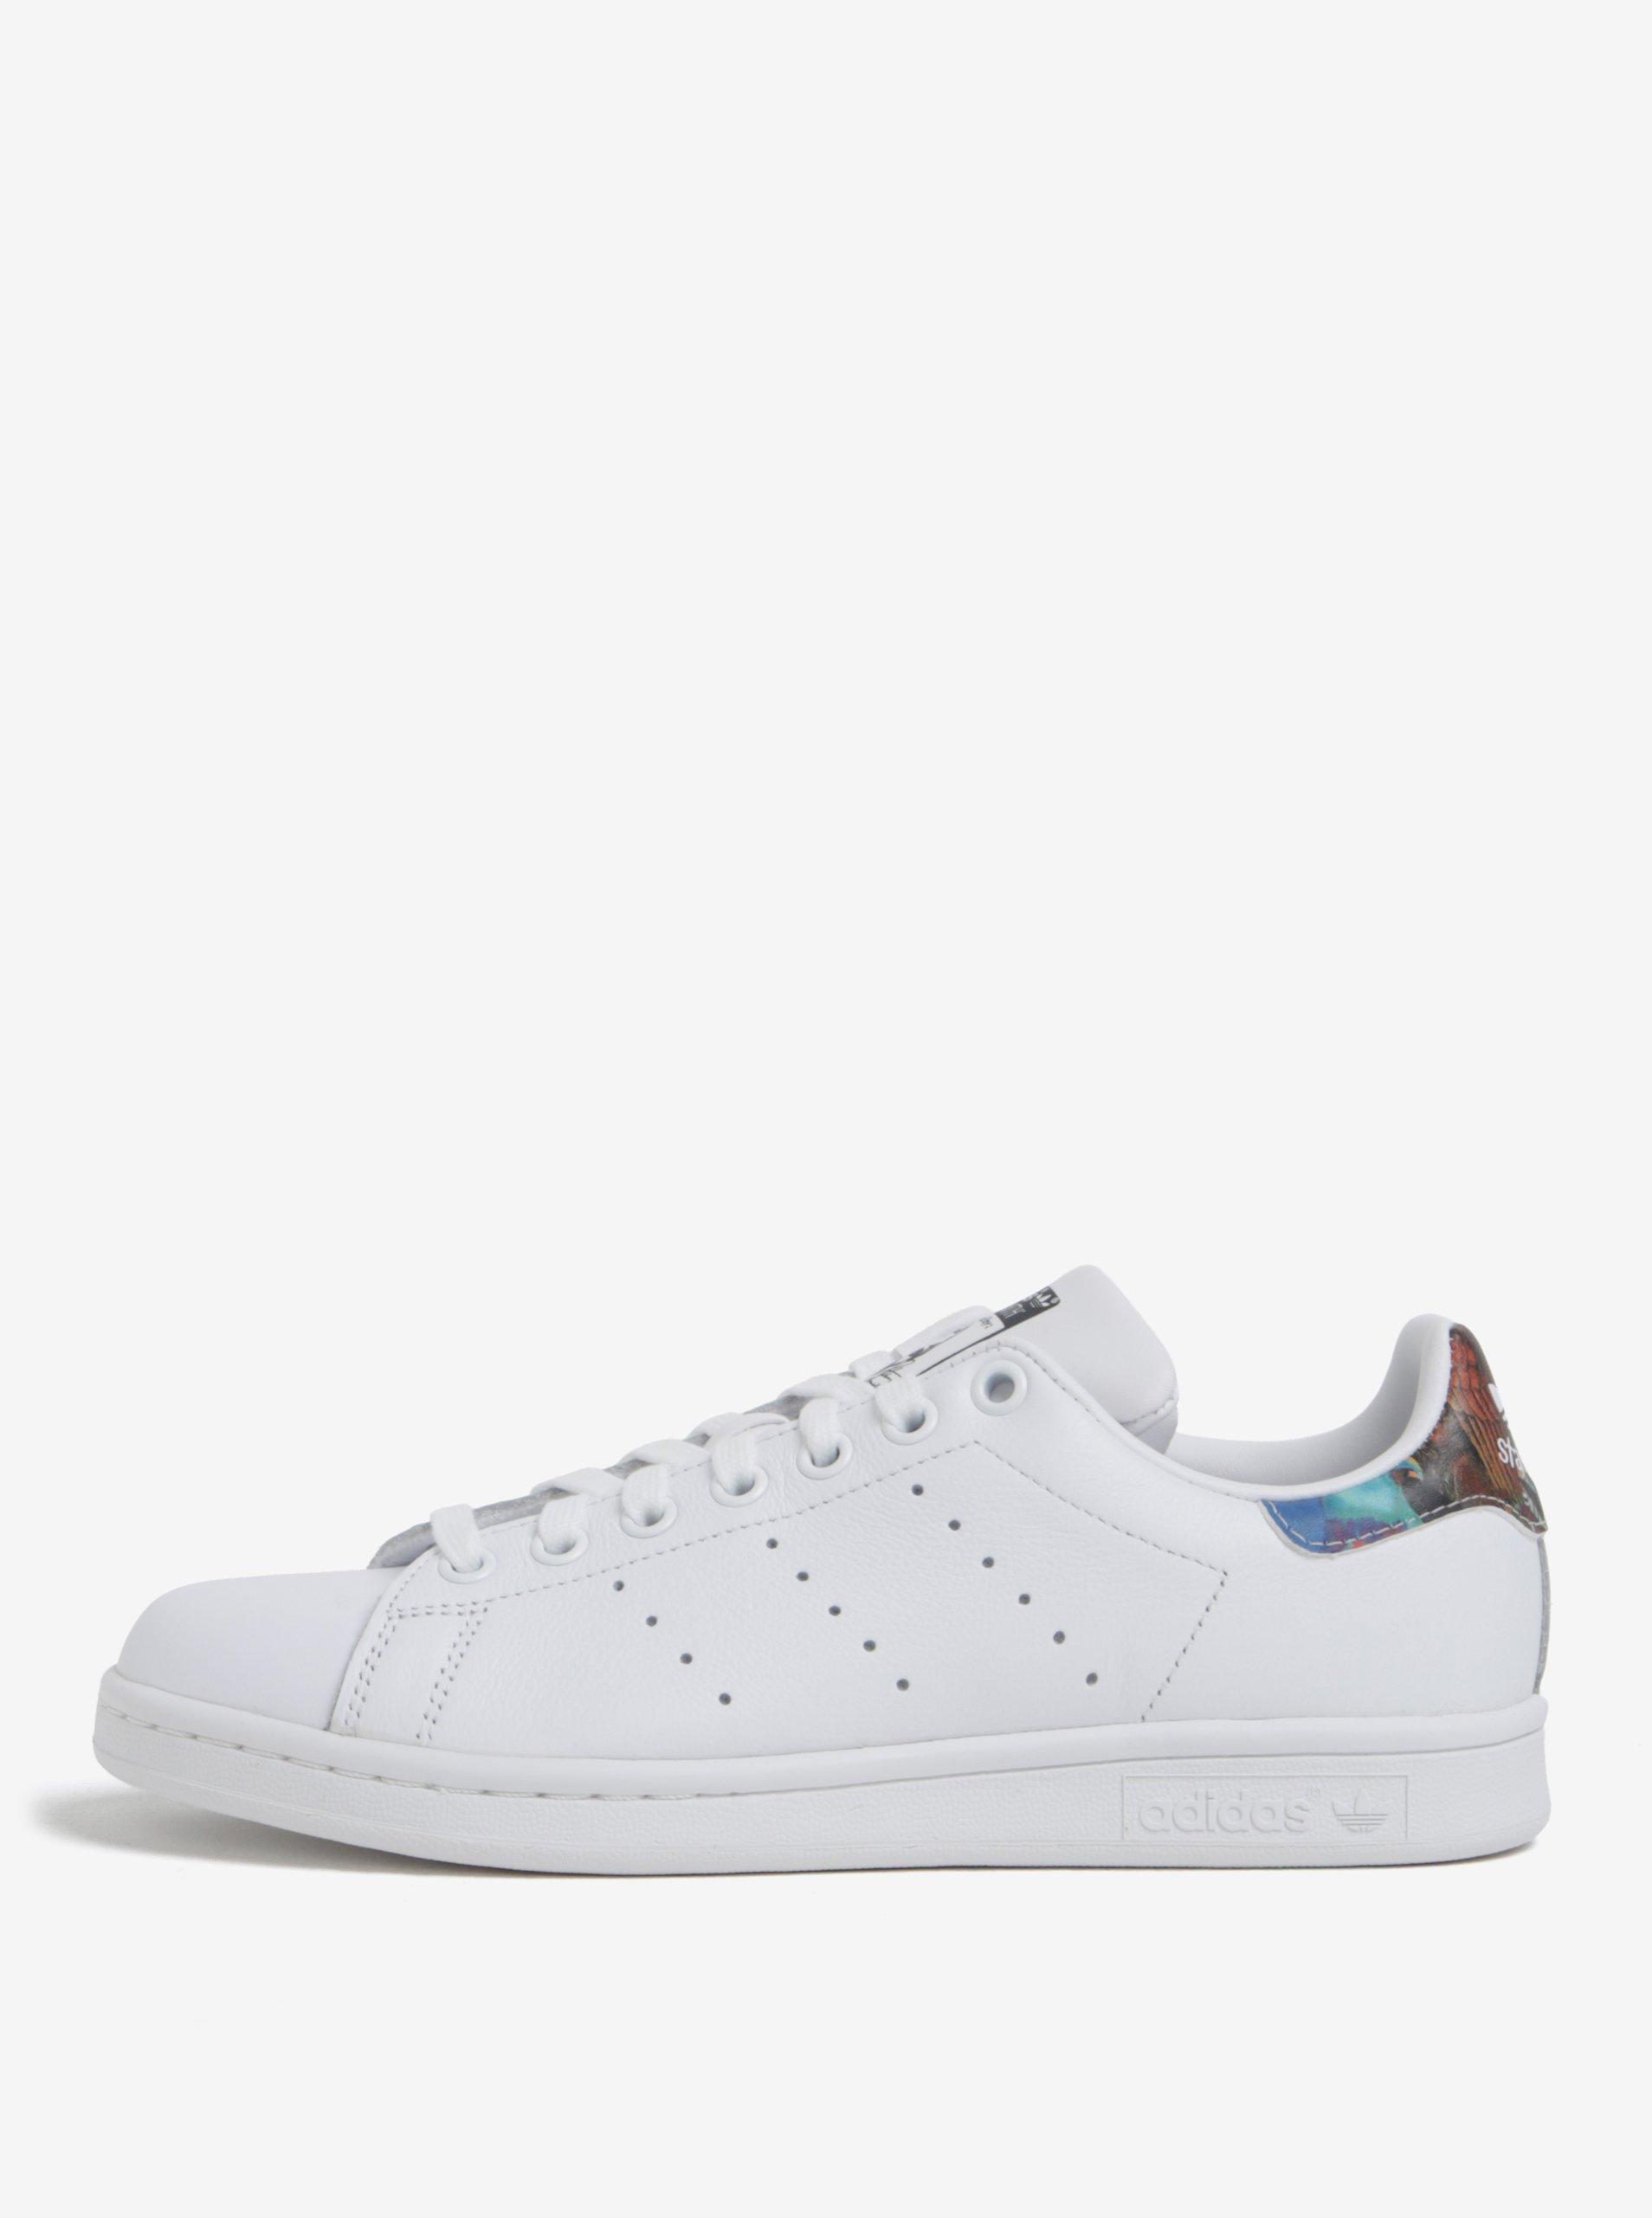 Bílé dámské tenisky s barevným detailem adidas Originals Stan Smith